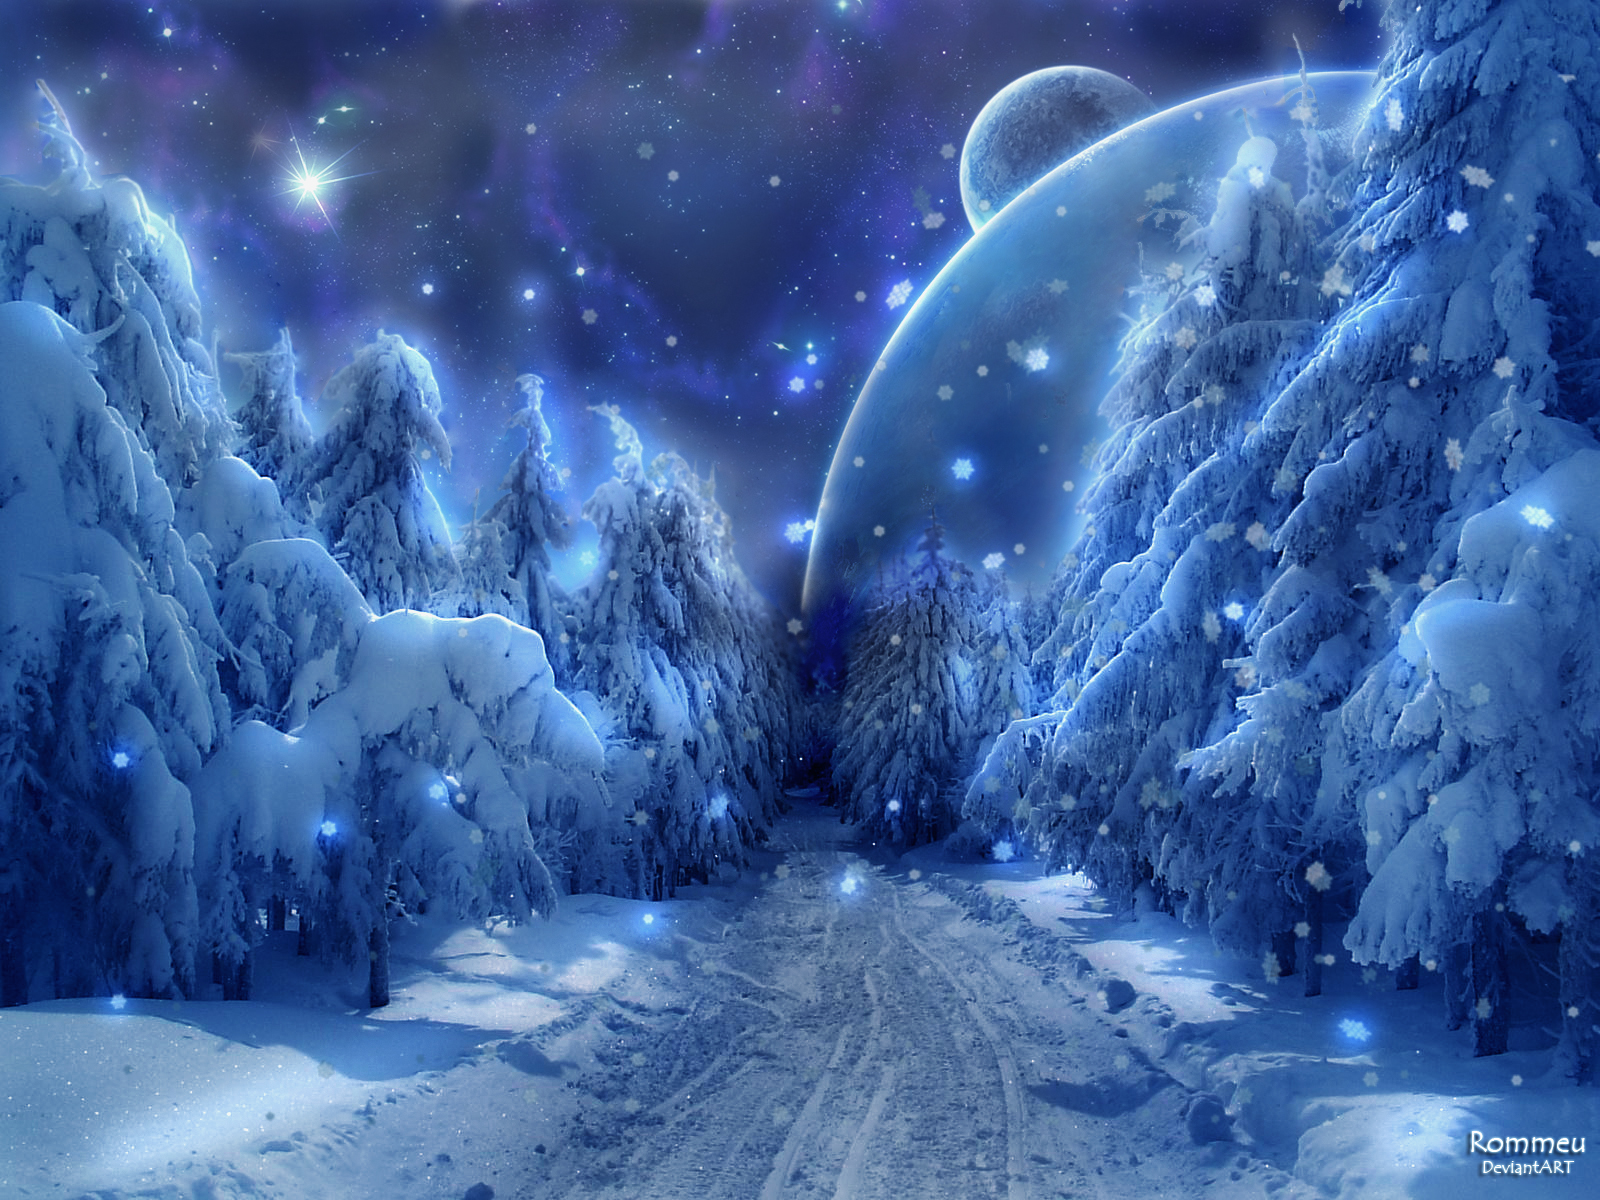 Download Winter Snow Wallpaper 1600x1200 Wallpoper 393934 1600x1200